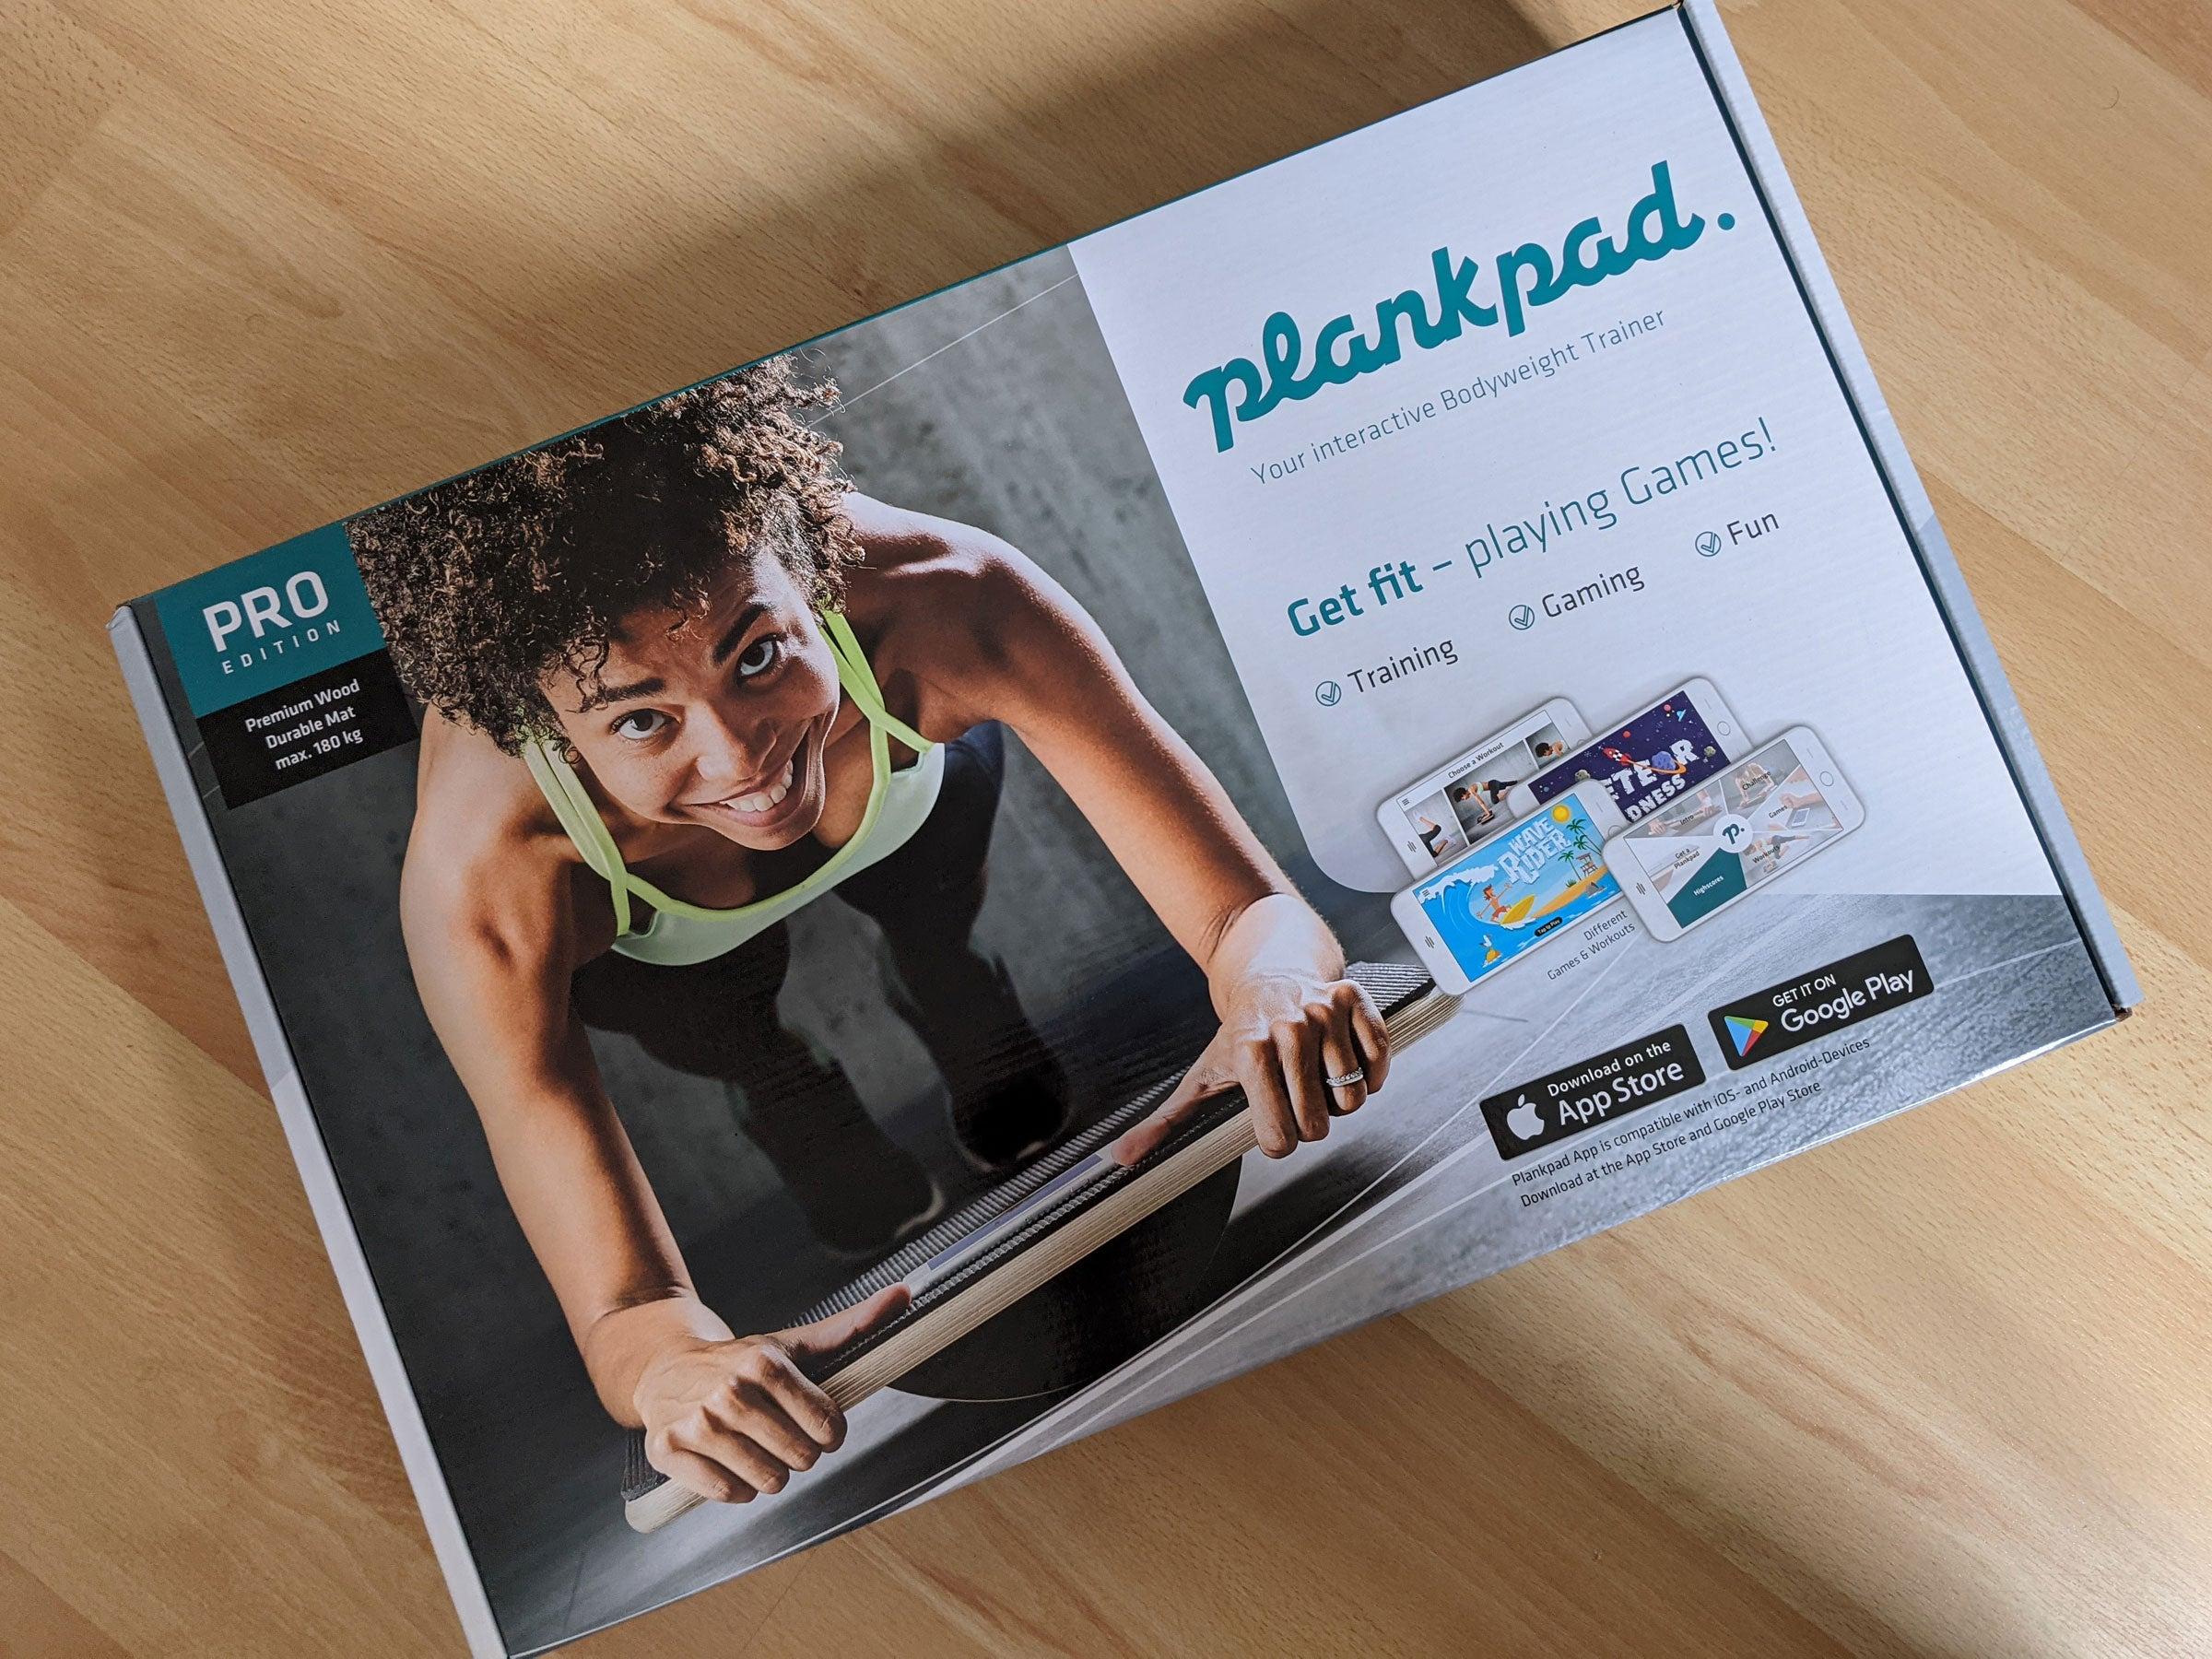 Verpackung des Plankpad